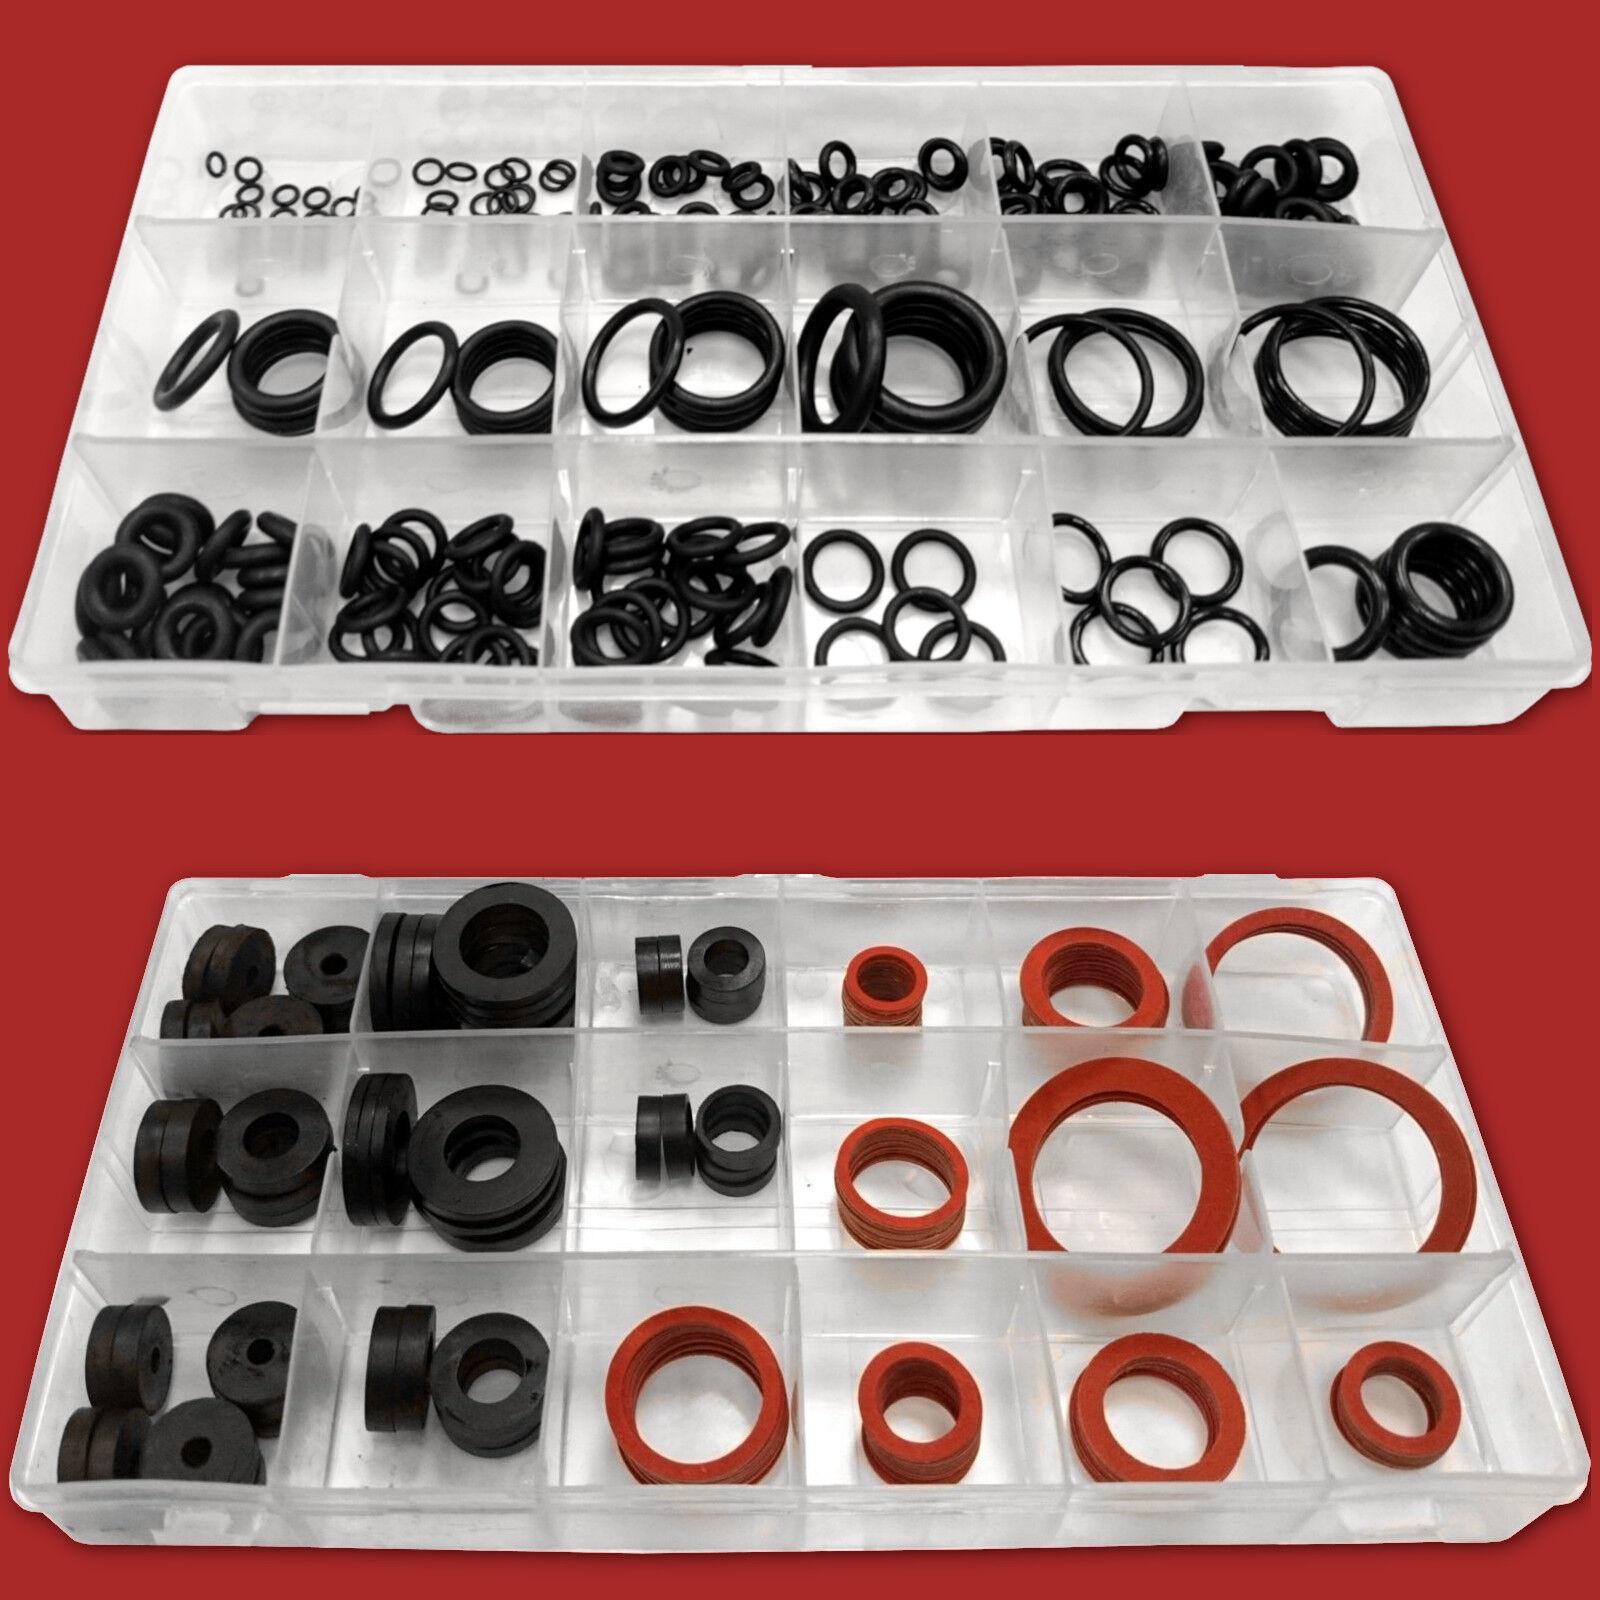 366-tlg. Sanitär-Dichtungen & O-Ring-Sortiment Dichtungsringe Gummi-Dichtung Set